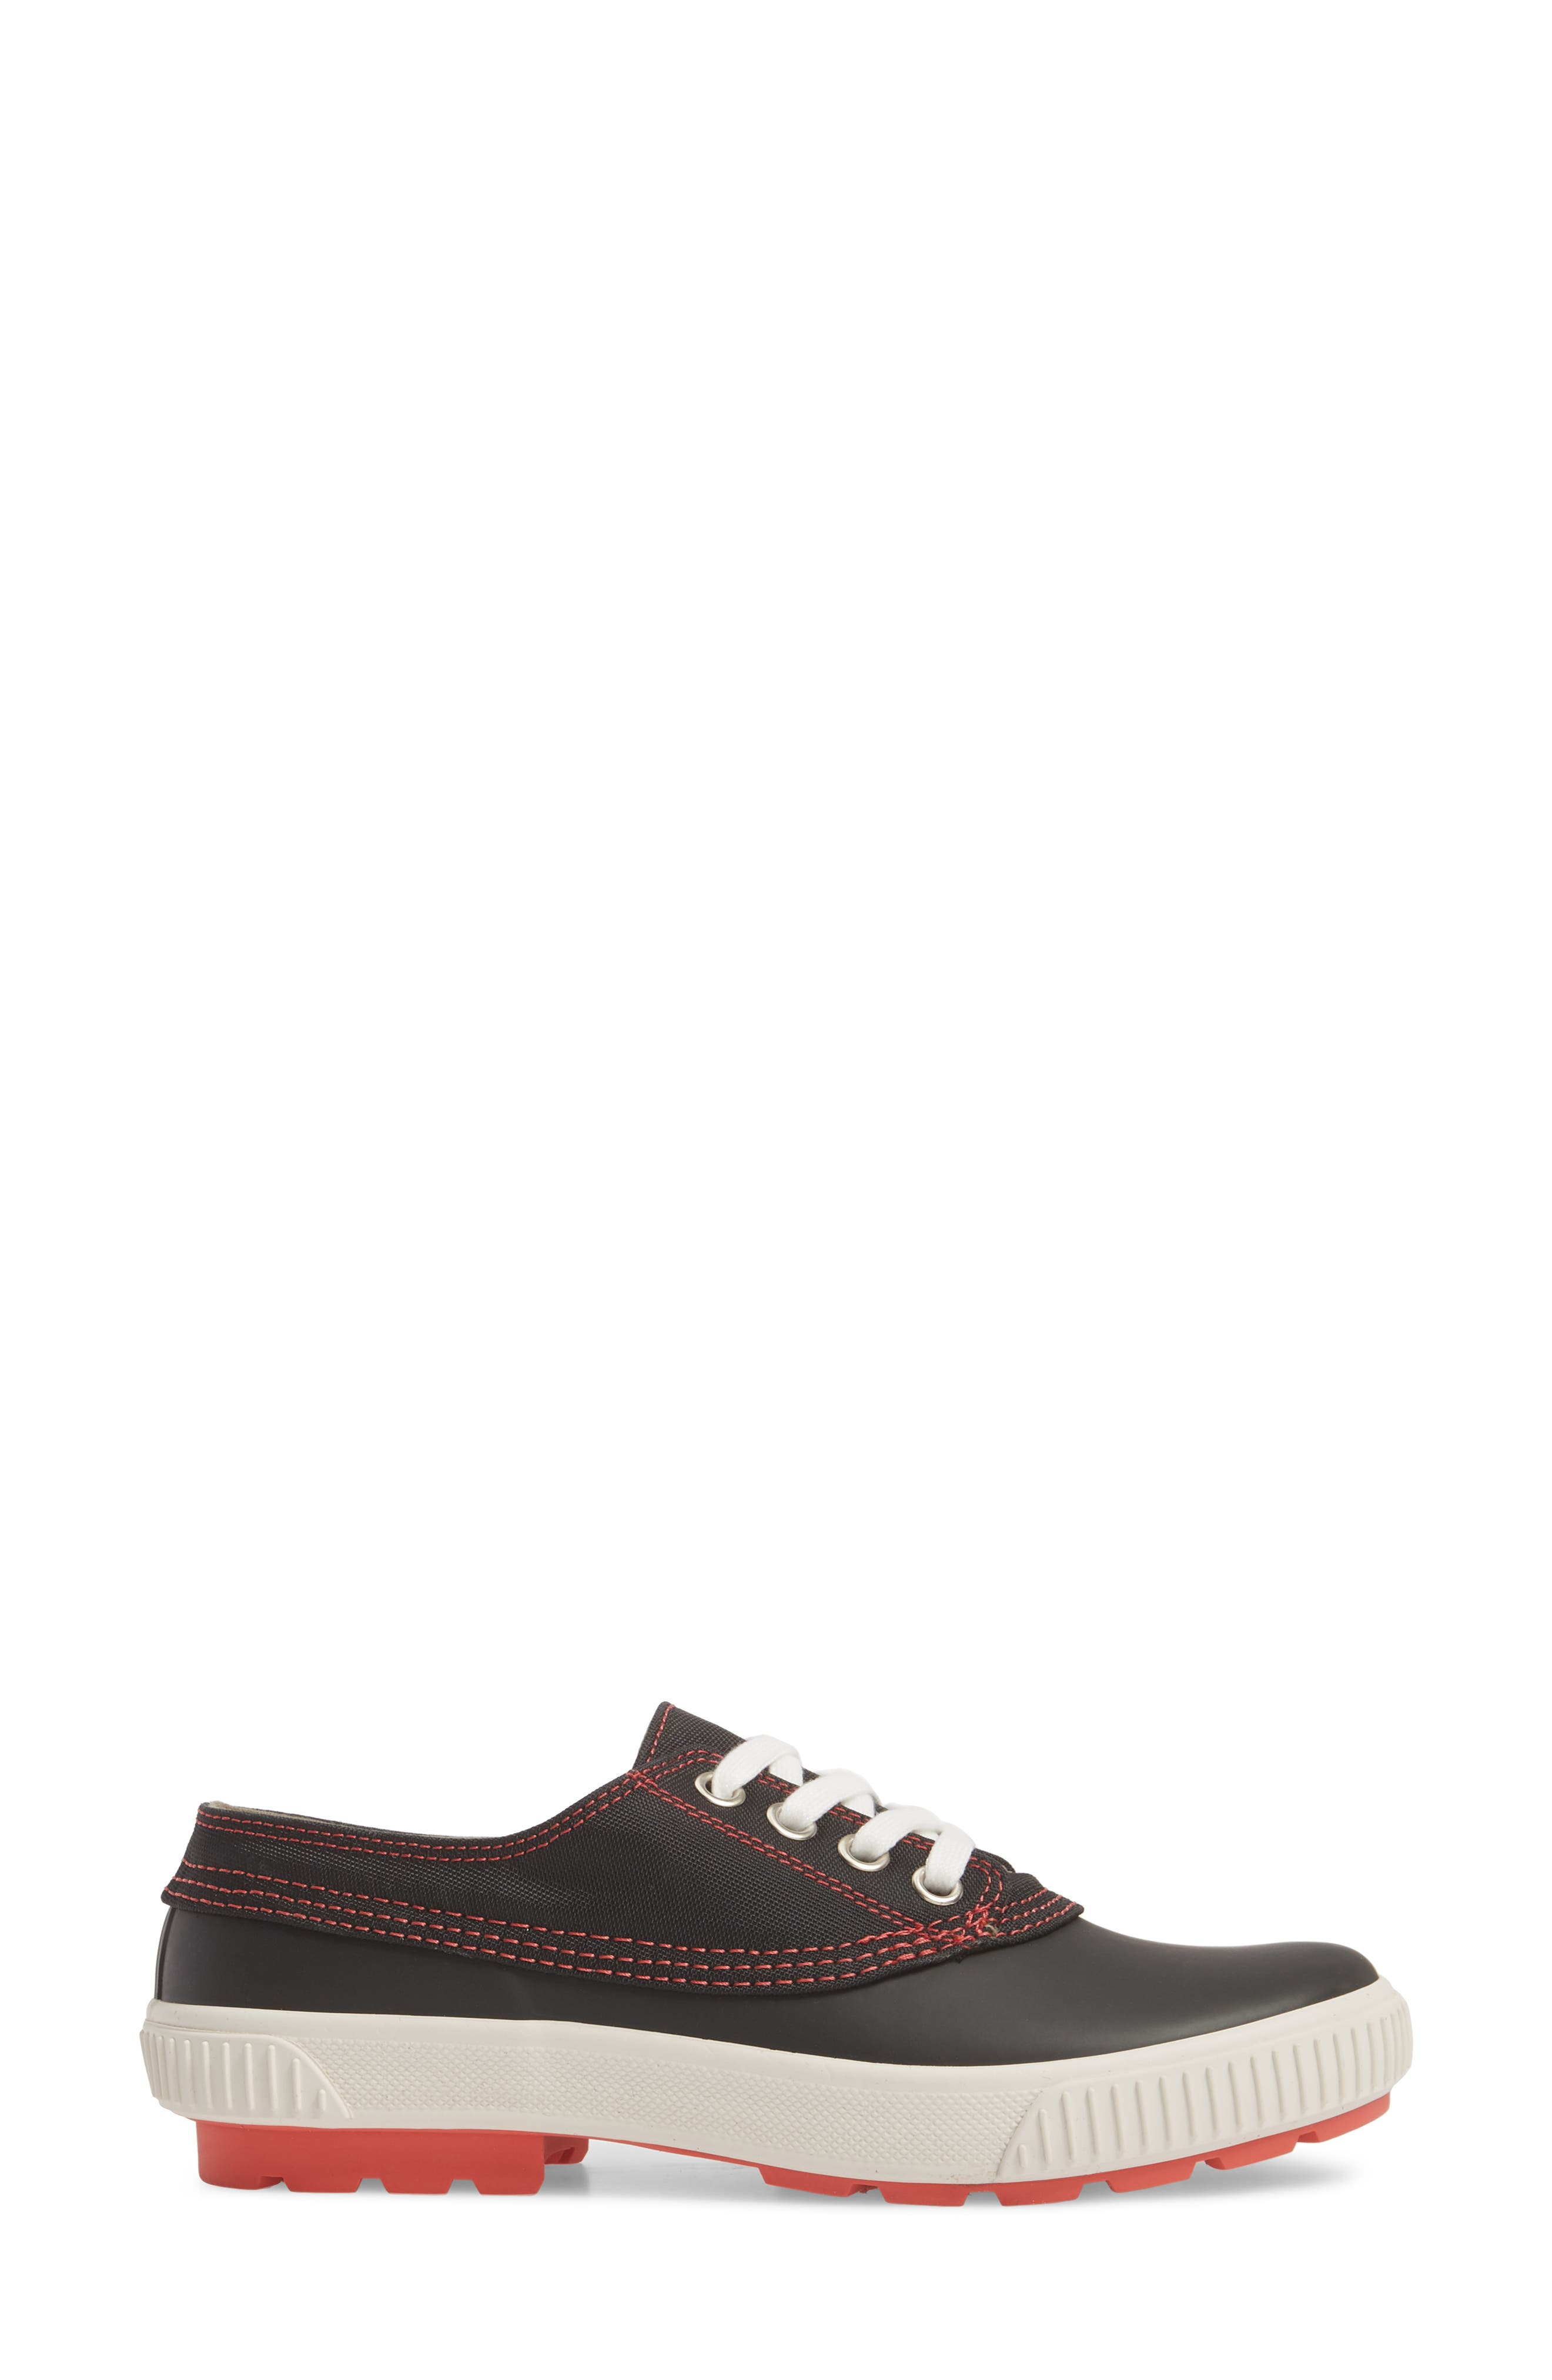 Dash Duck Sneaker,                             Alternate thumbnail 3, color,                             Black/ Coral